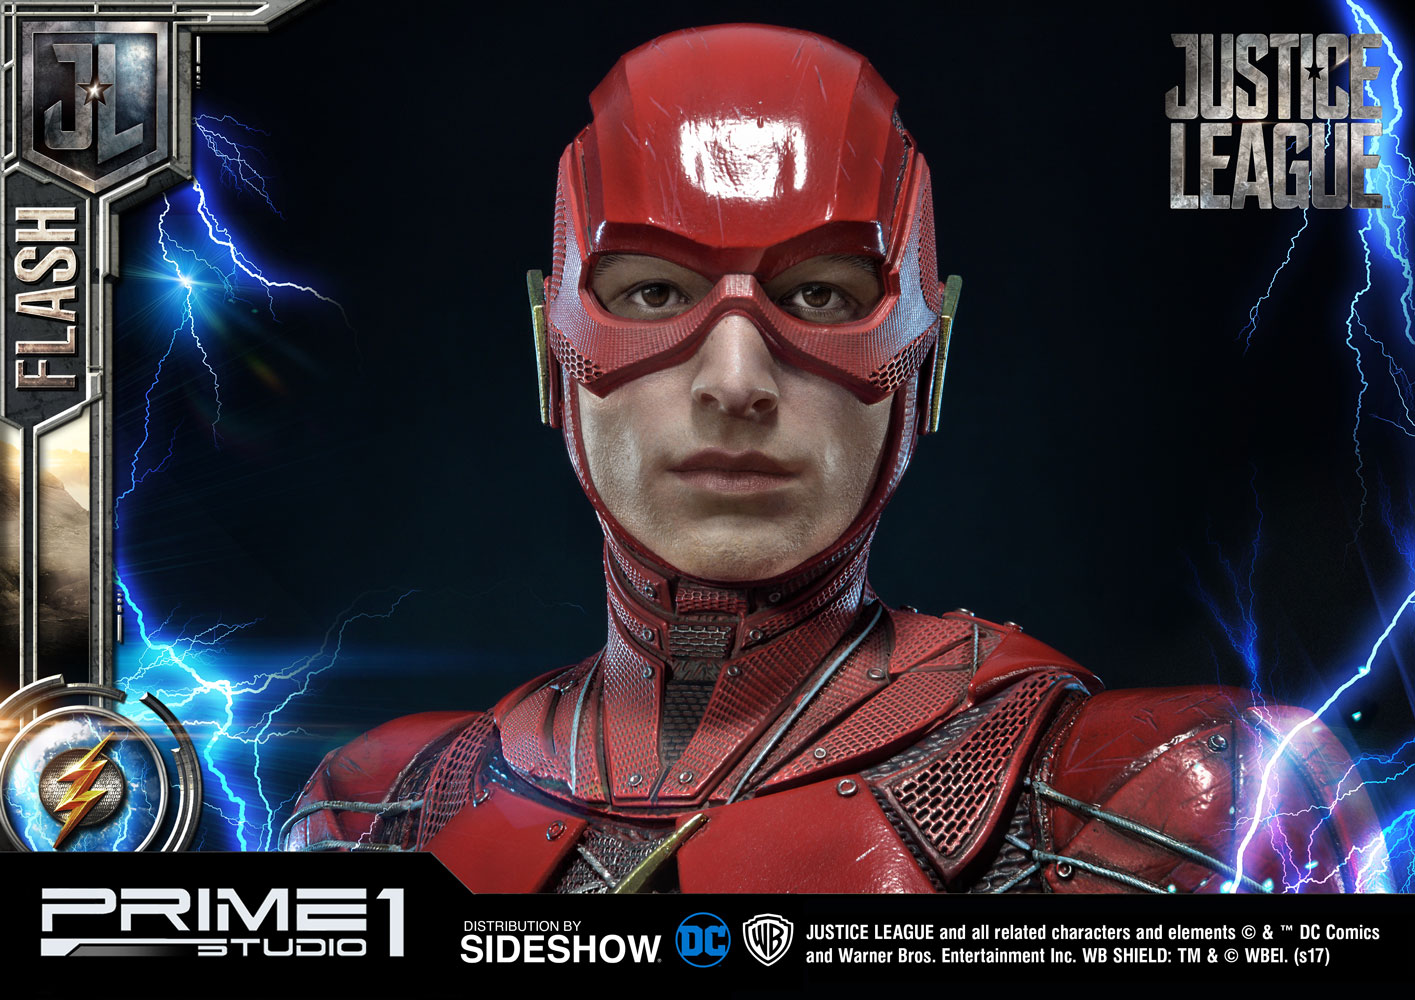 Justice League The Flash Statue